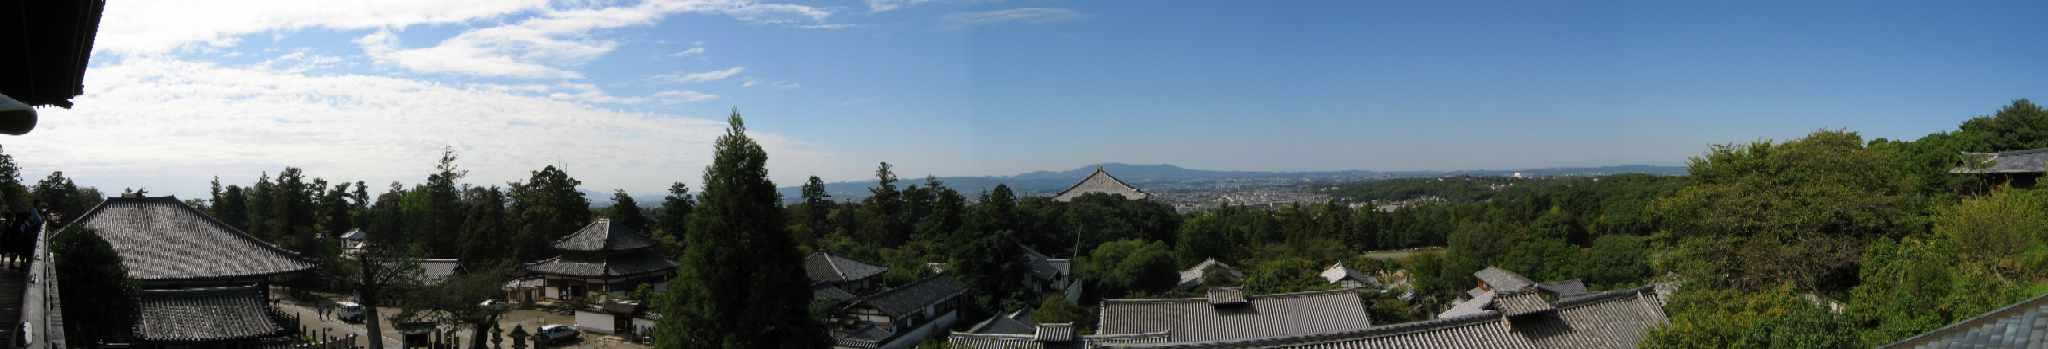 Nara Panorama